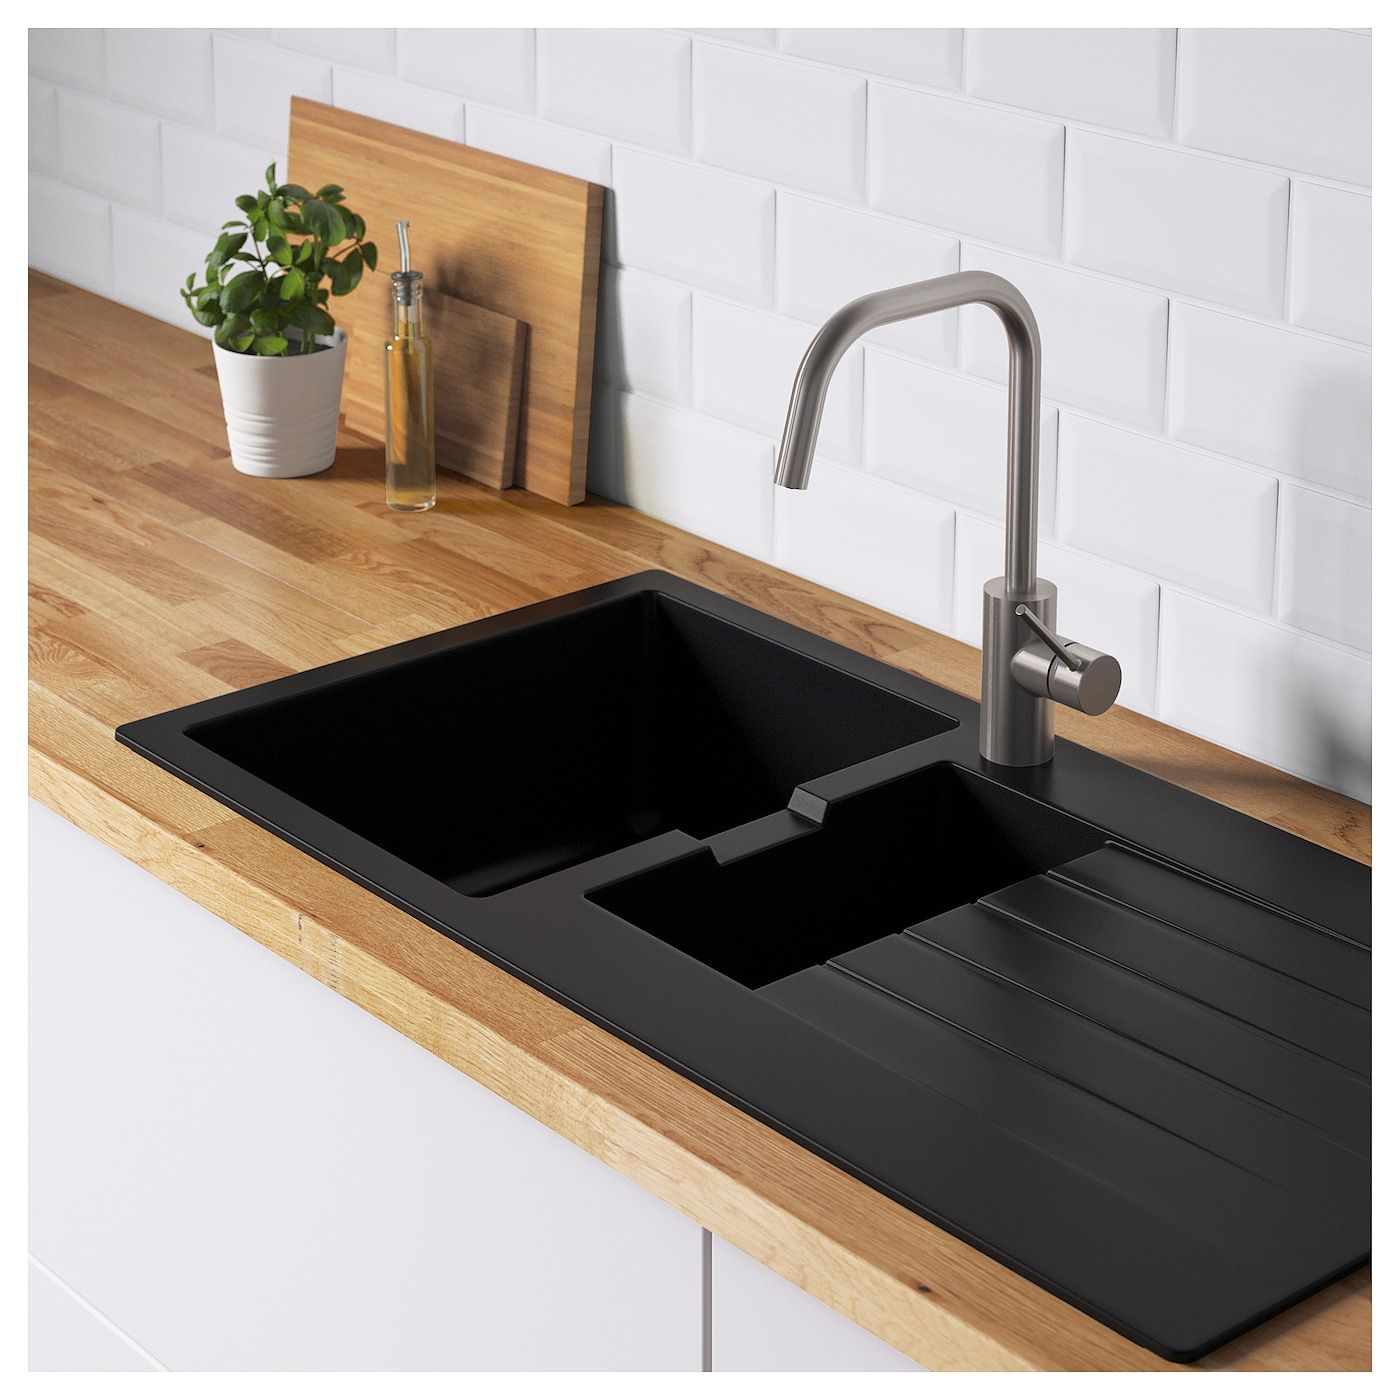 HÄllviken Indbygningsvask 1½ Vask Afløbspl Sort Quartzkomposit Ikea Spülbecken Design Schwarze Spüle Einbauspüle